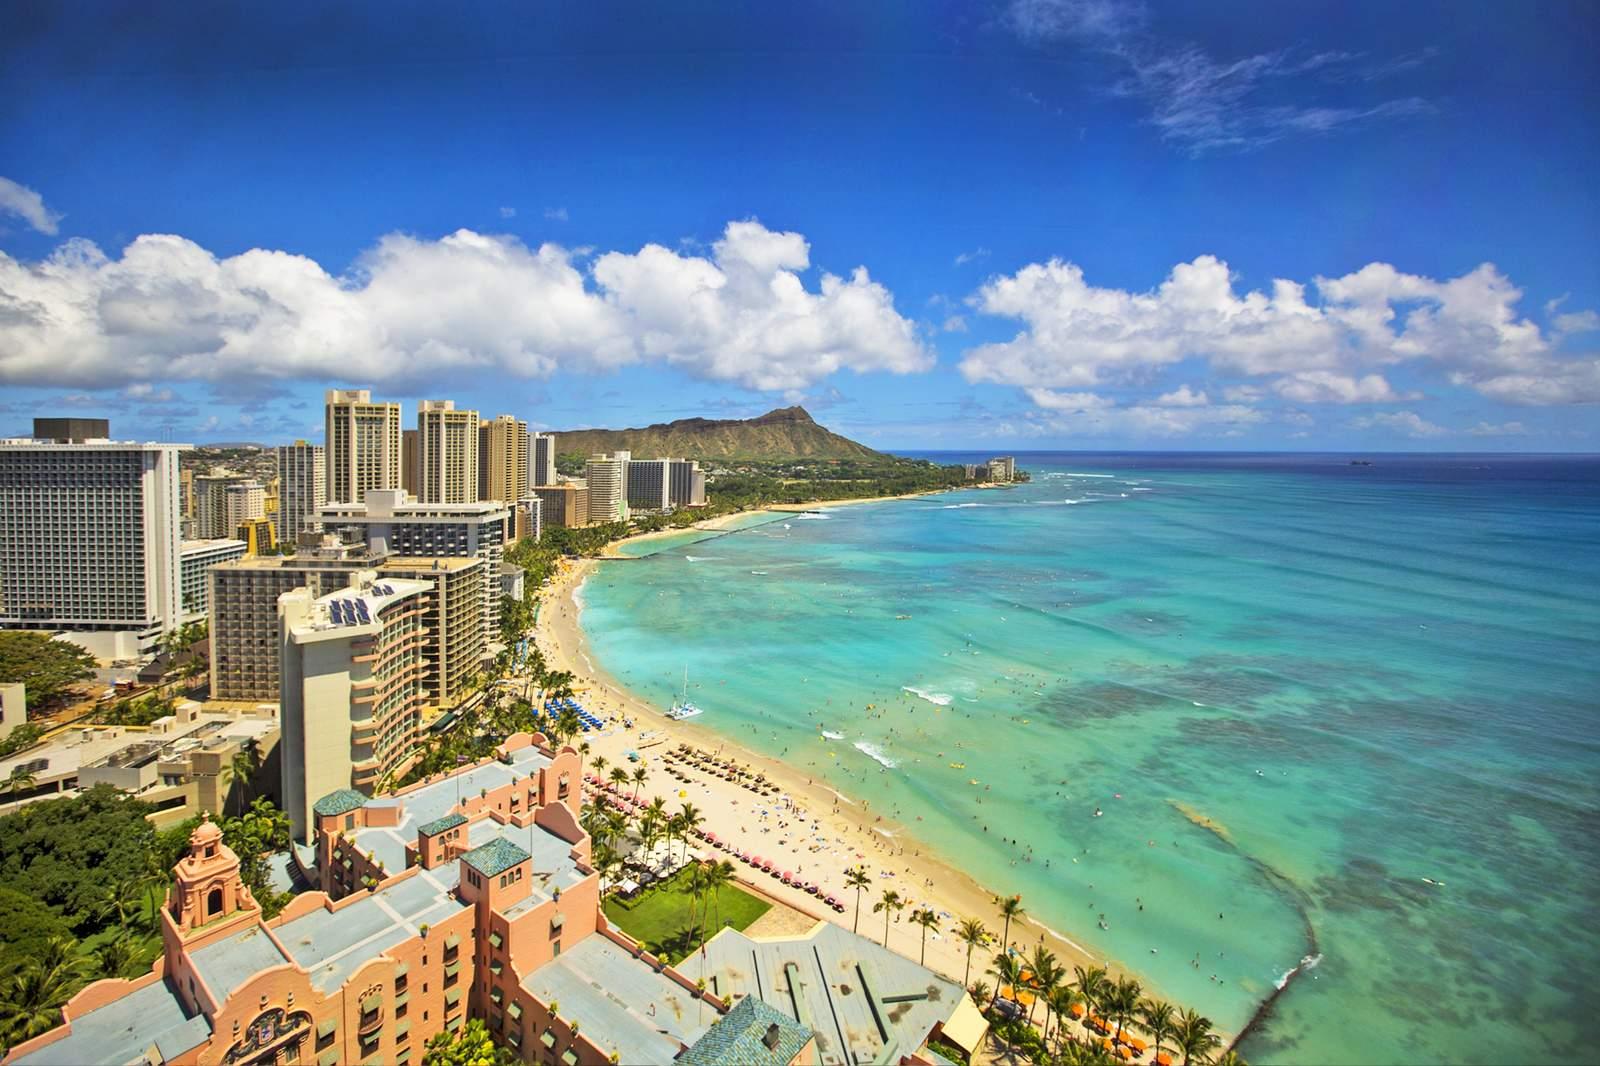 Oahu, Waikiki